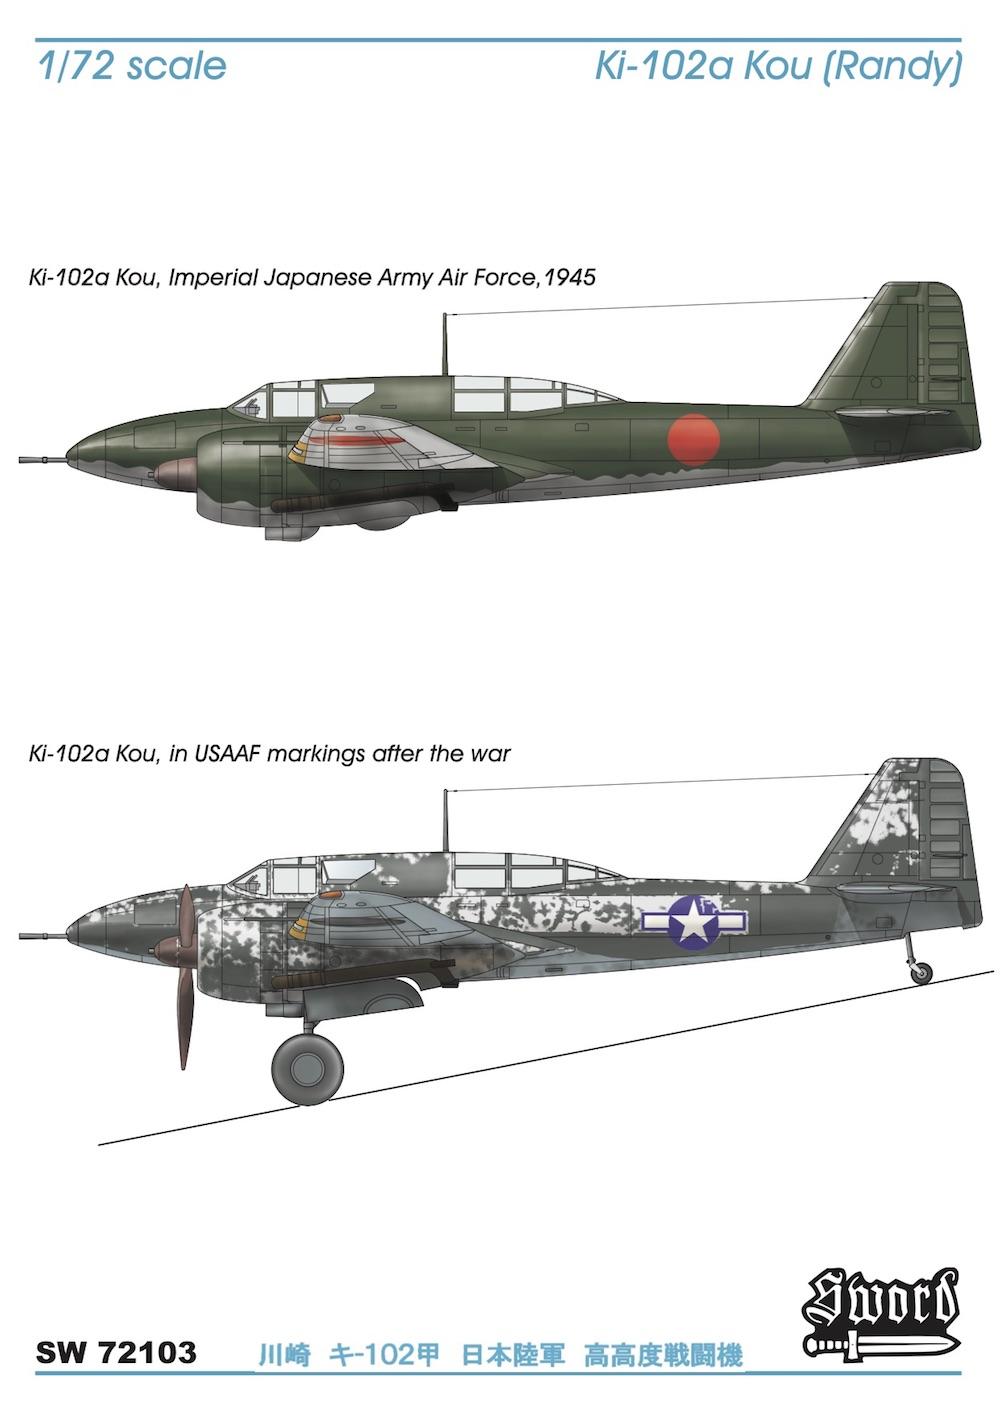 Sword 1/72 Kawasaki Ki-102a Otsu (Randy) Fighter, turbo-Charged version # 72103